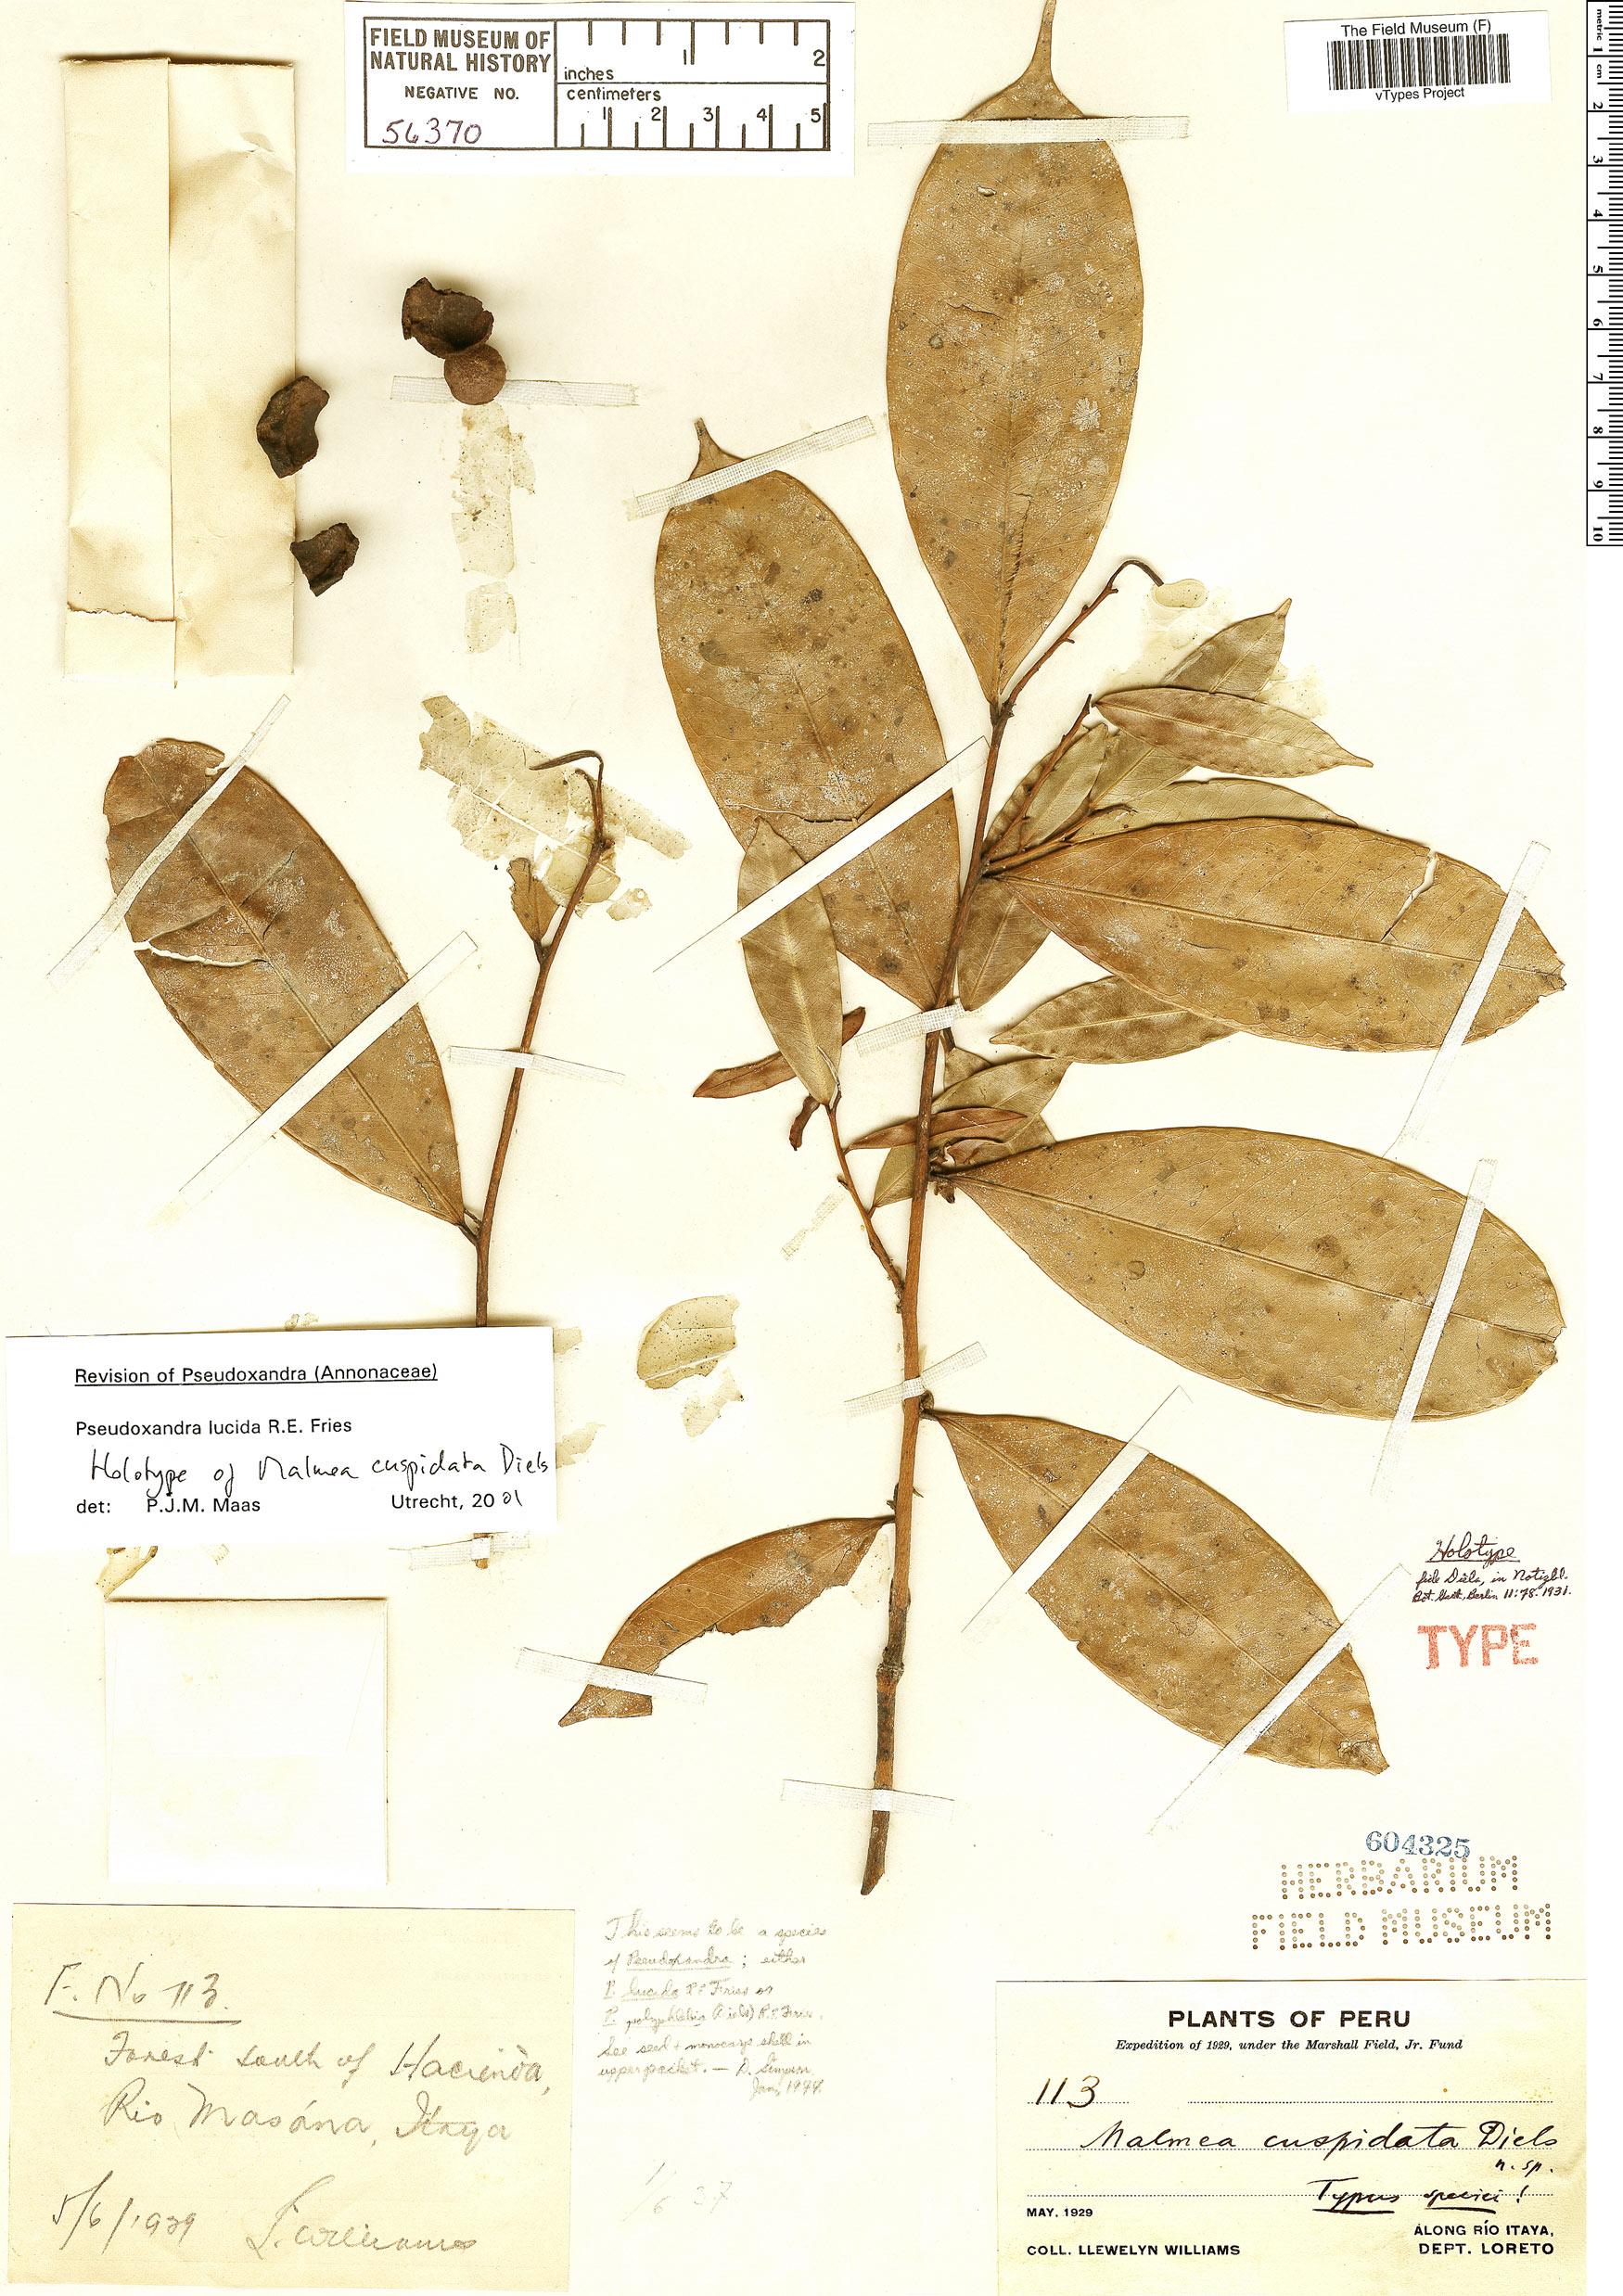 Specimen: Pseudoxandra lucida